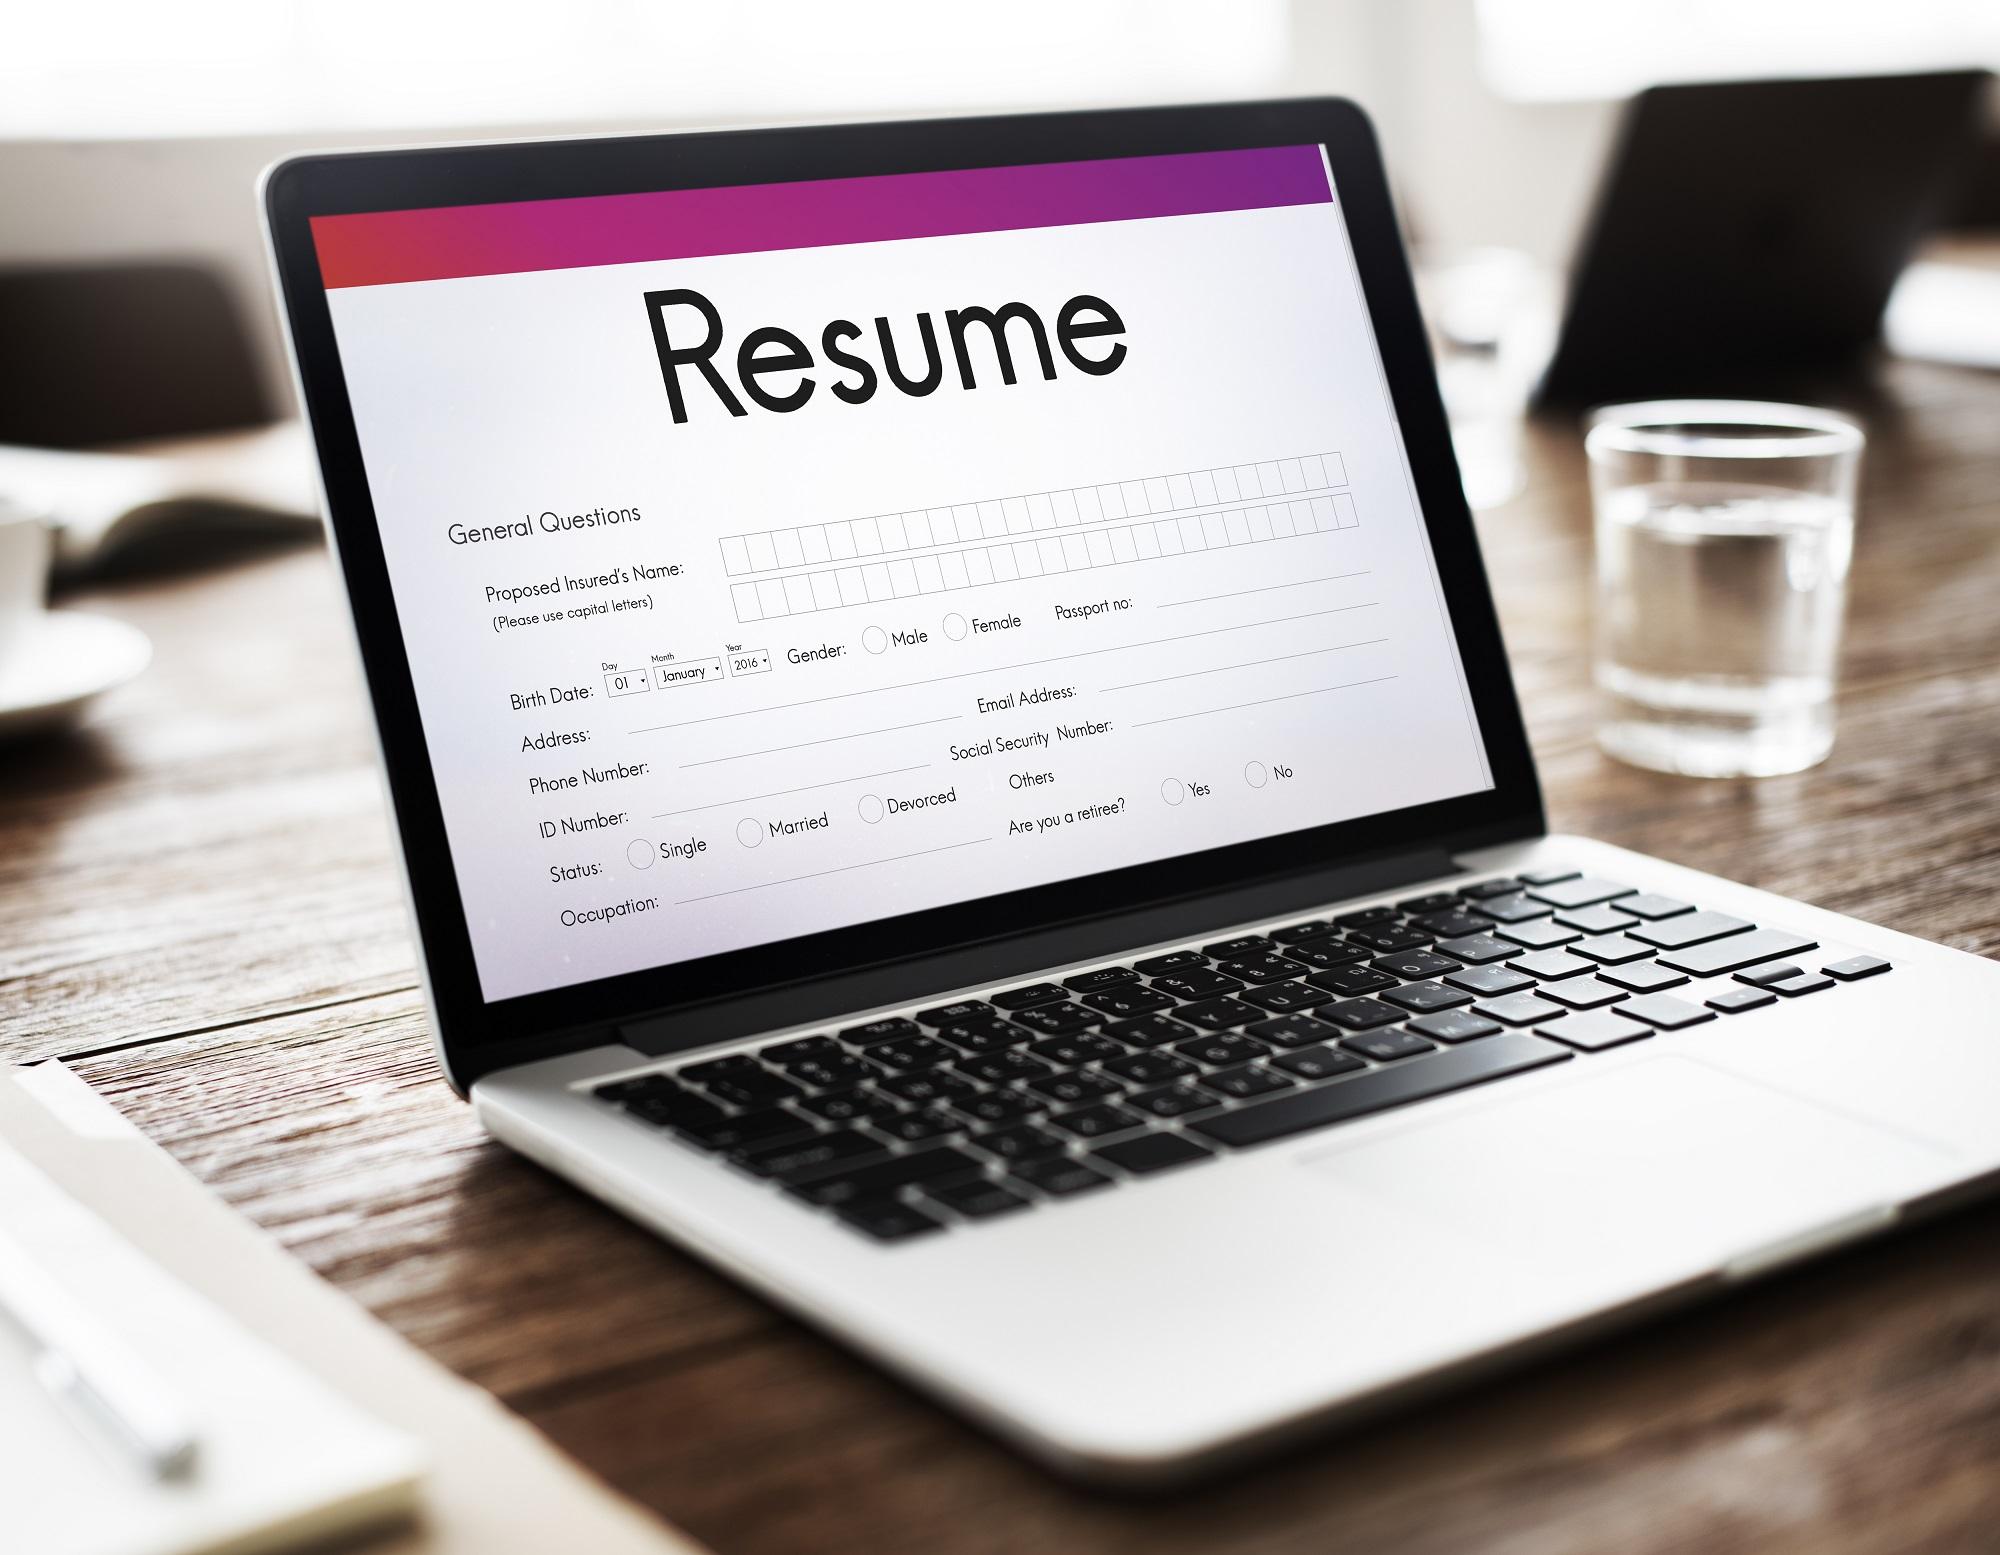 Laptop displaying a resume template.